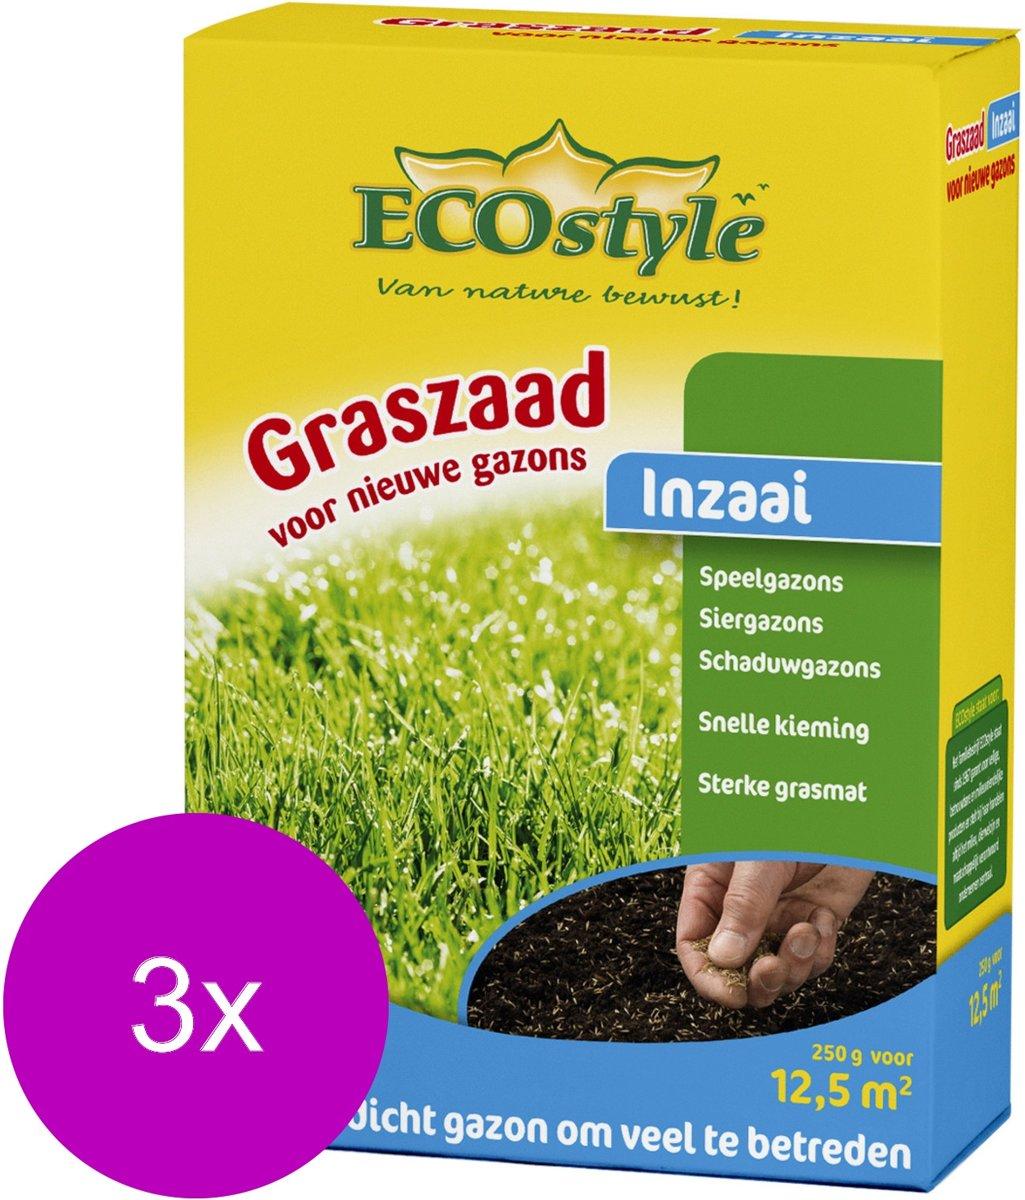 Ecostyle Graszaad-Inzaai 12.5 m2 - Graszaden - 3 x 250 g kopen